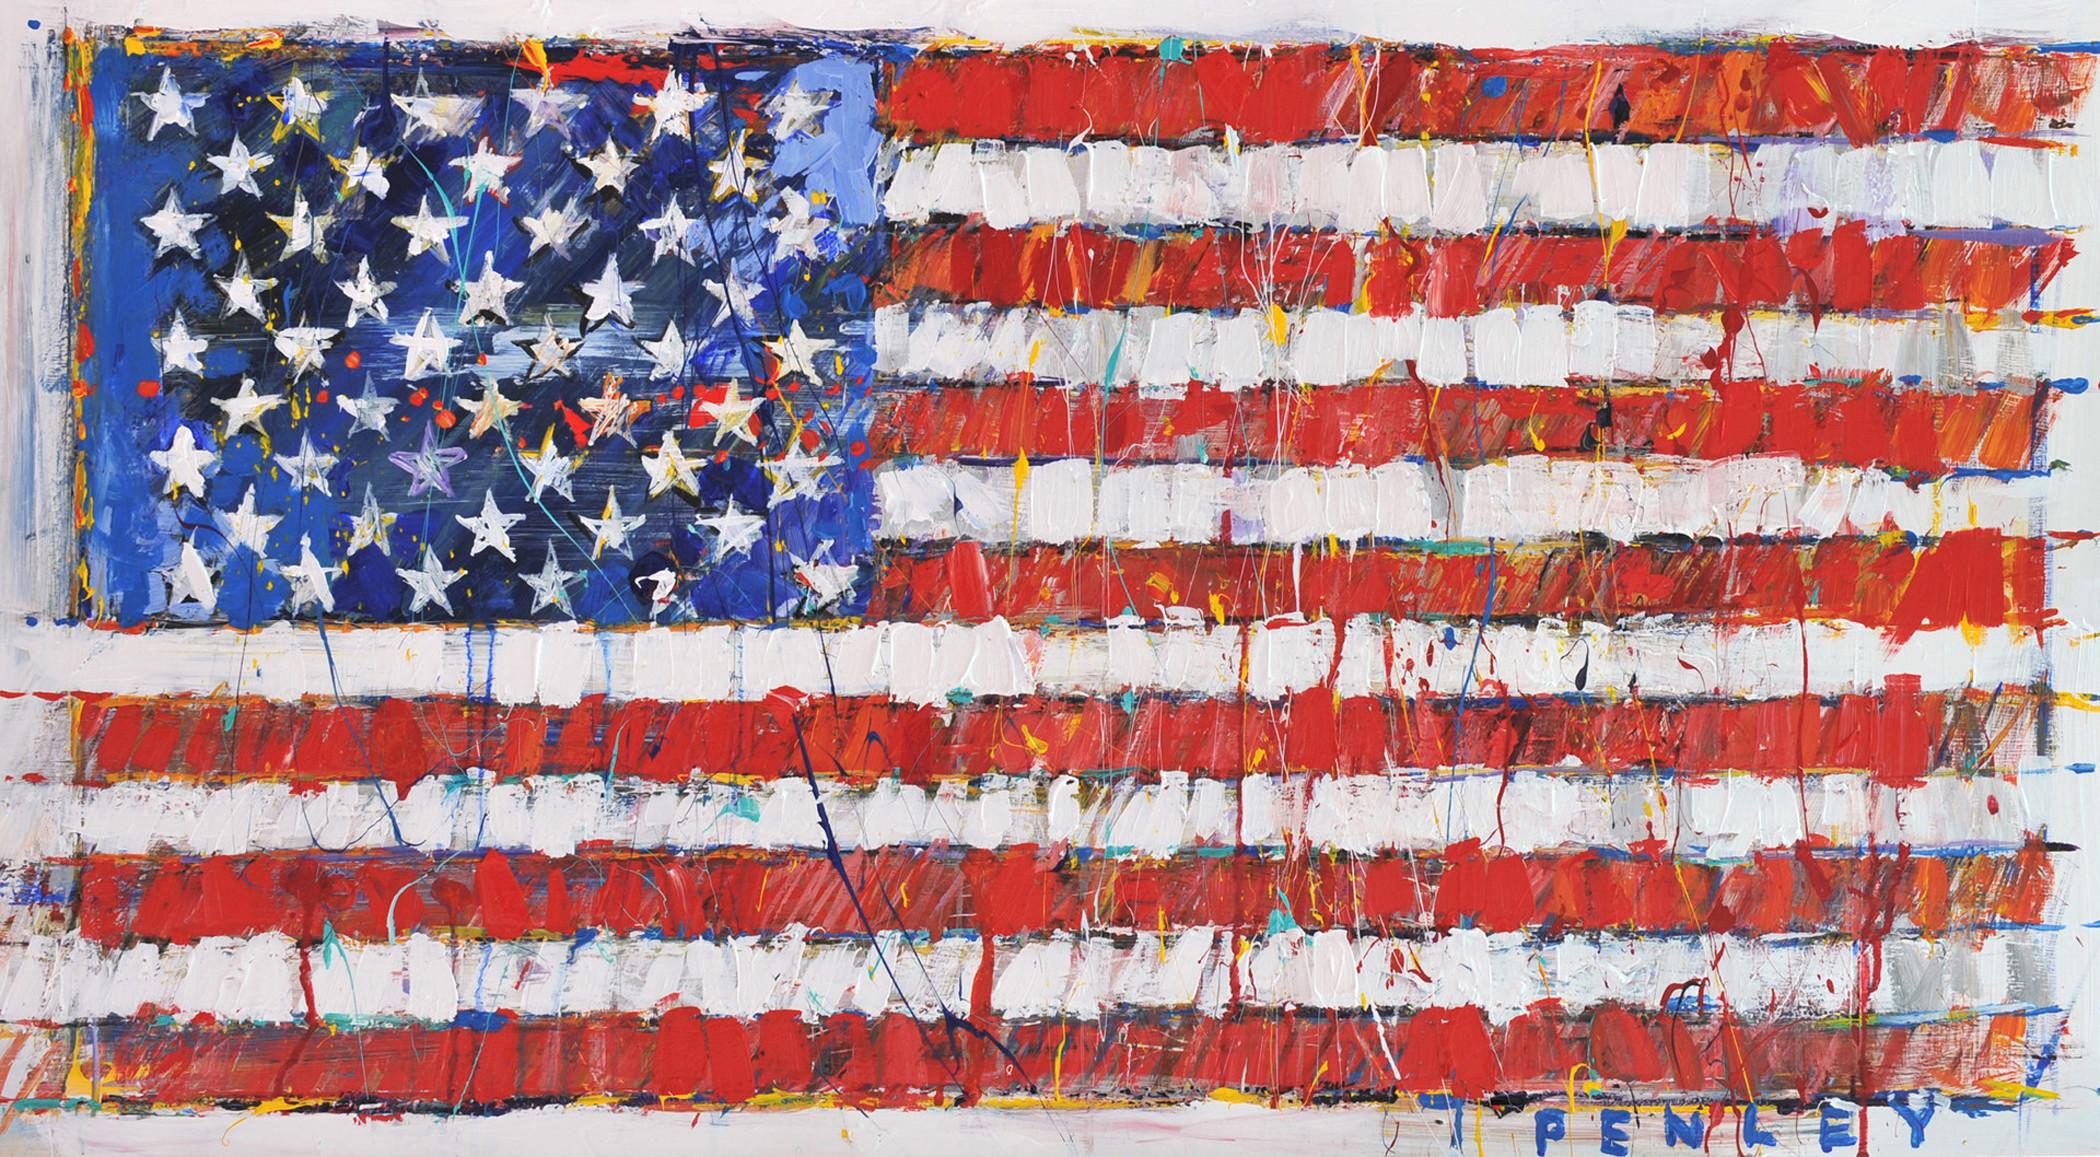 Endearing American Flag Wallpaper Wallpapers HD Wallpaper x 0x0